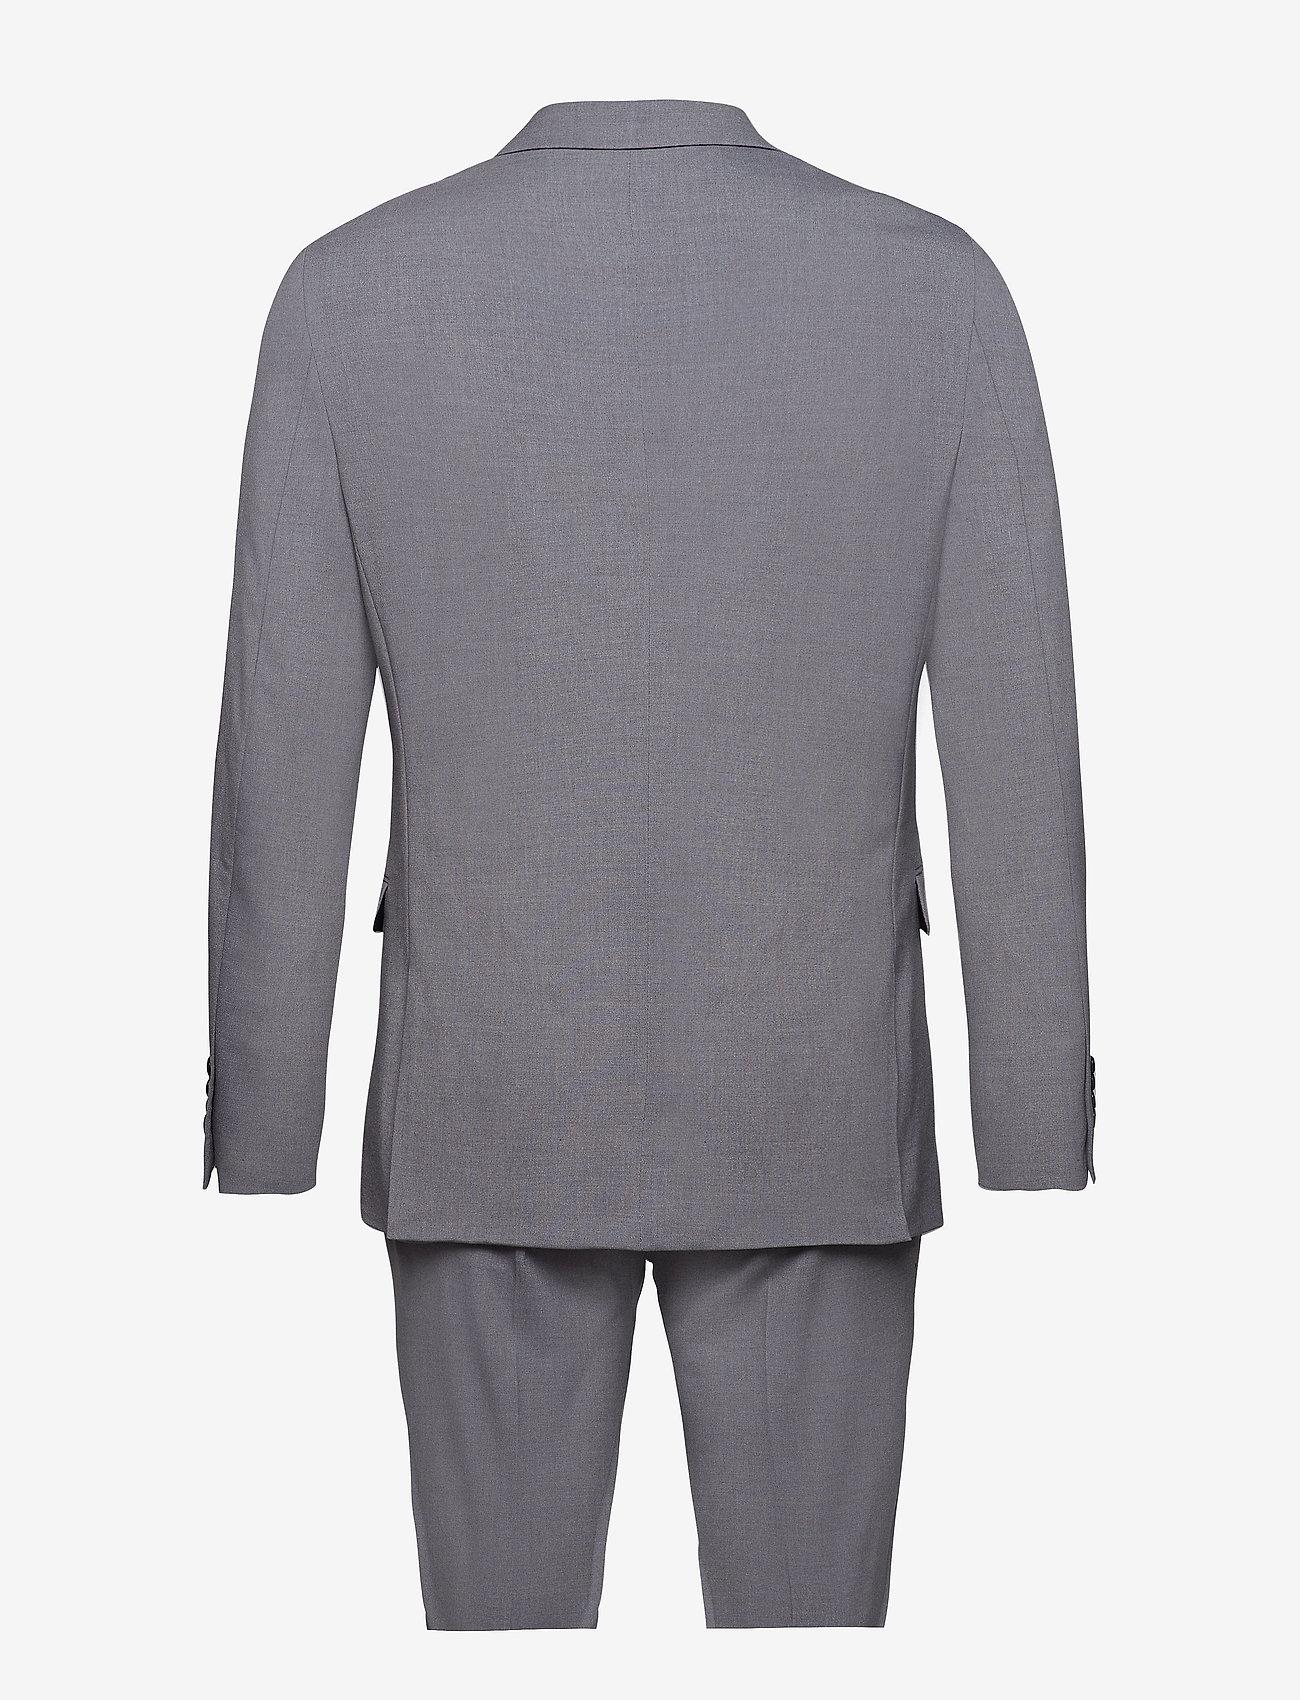 Lindbergh - Plain mens suit - yksiriviset puvut - lt grey - 1